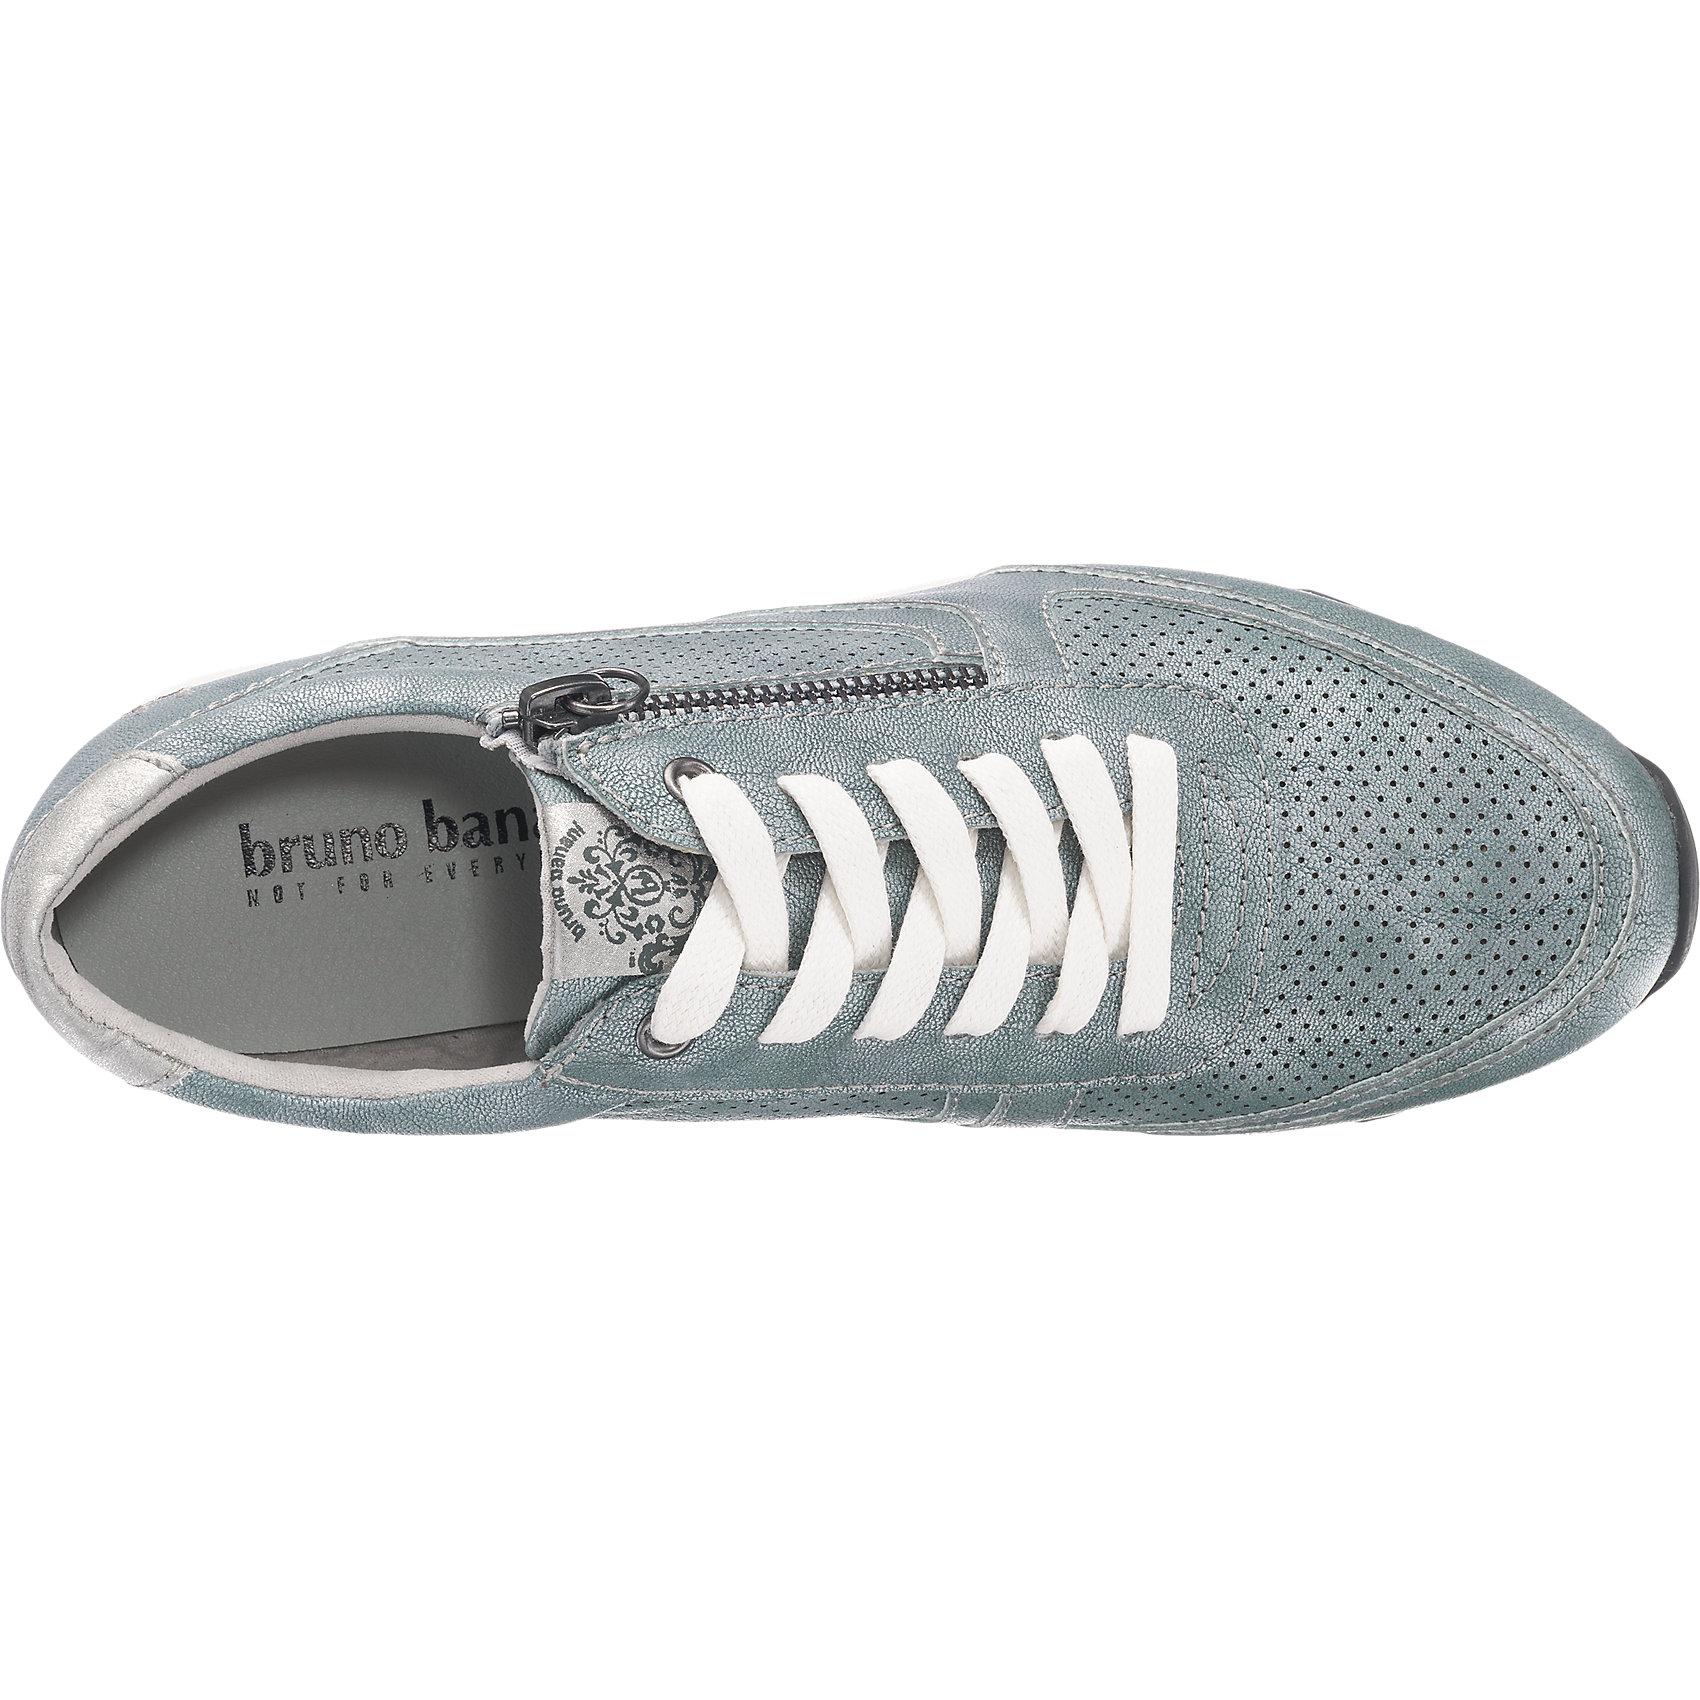 Neu bruno banani Sneakers offWEISS blau 5767724